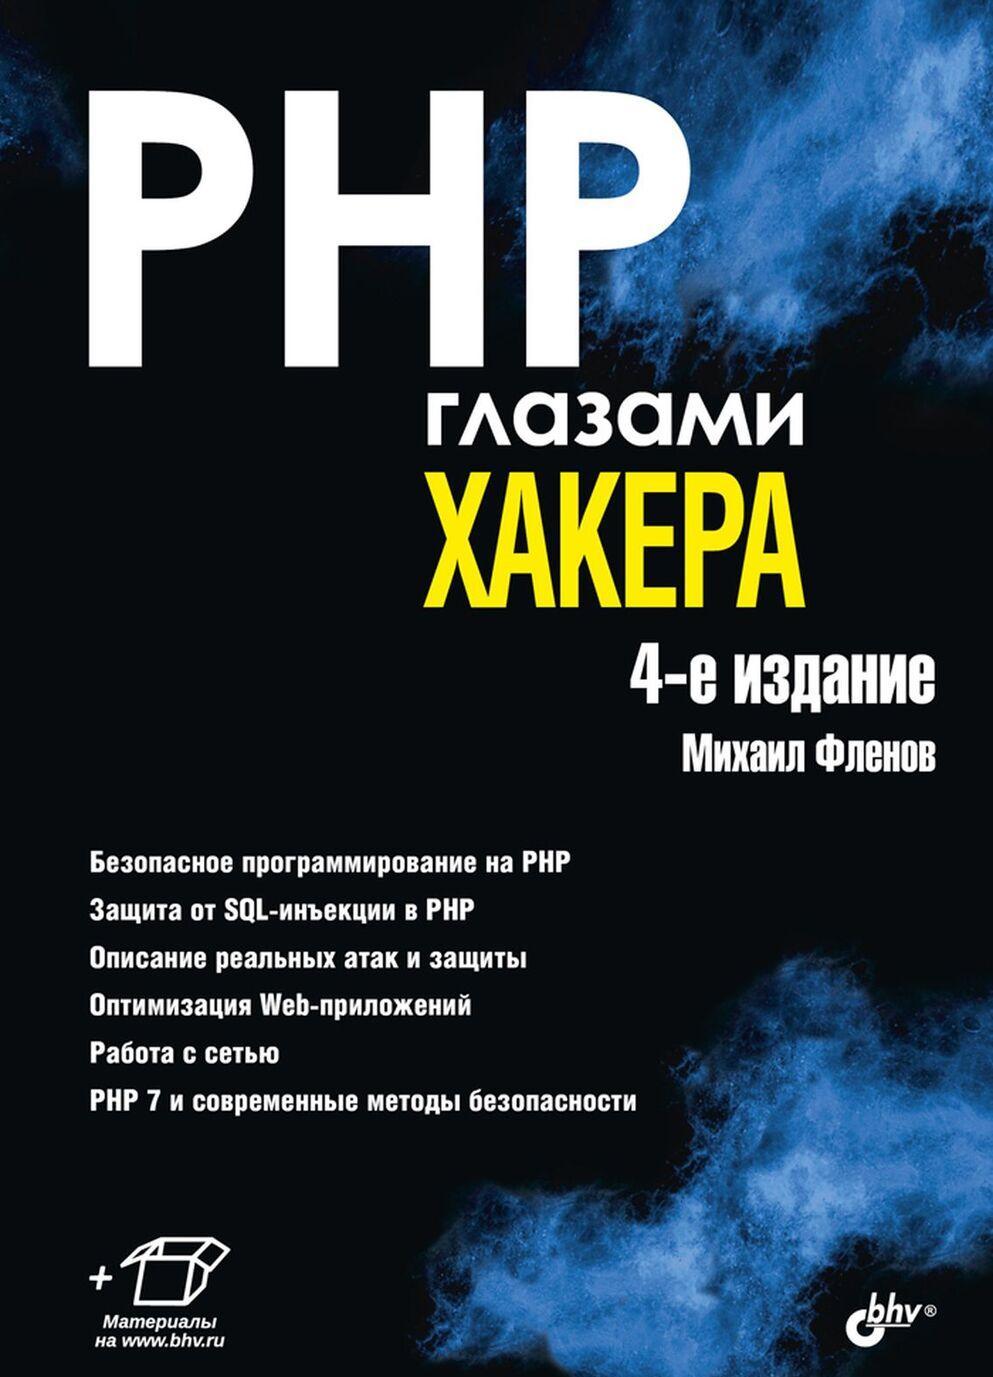 PHP glazami khakera